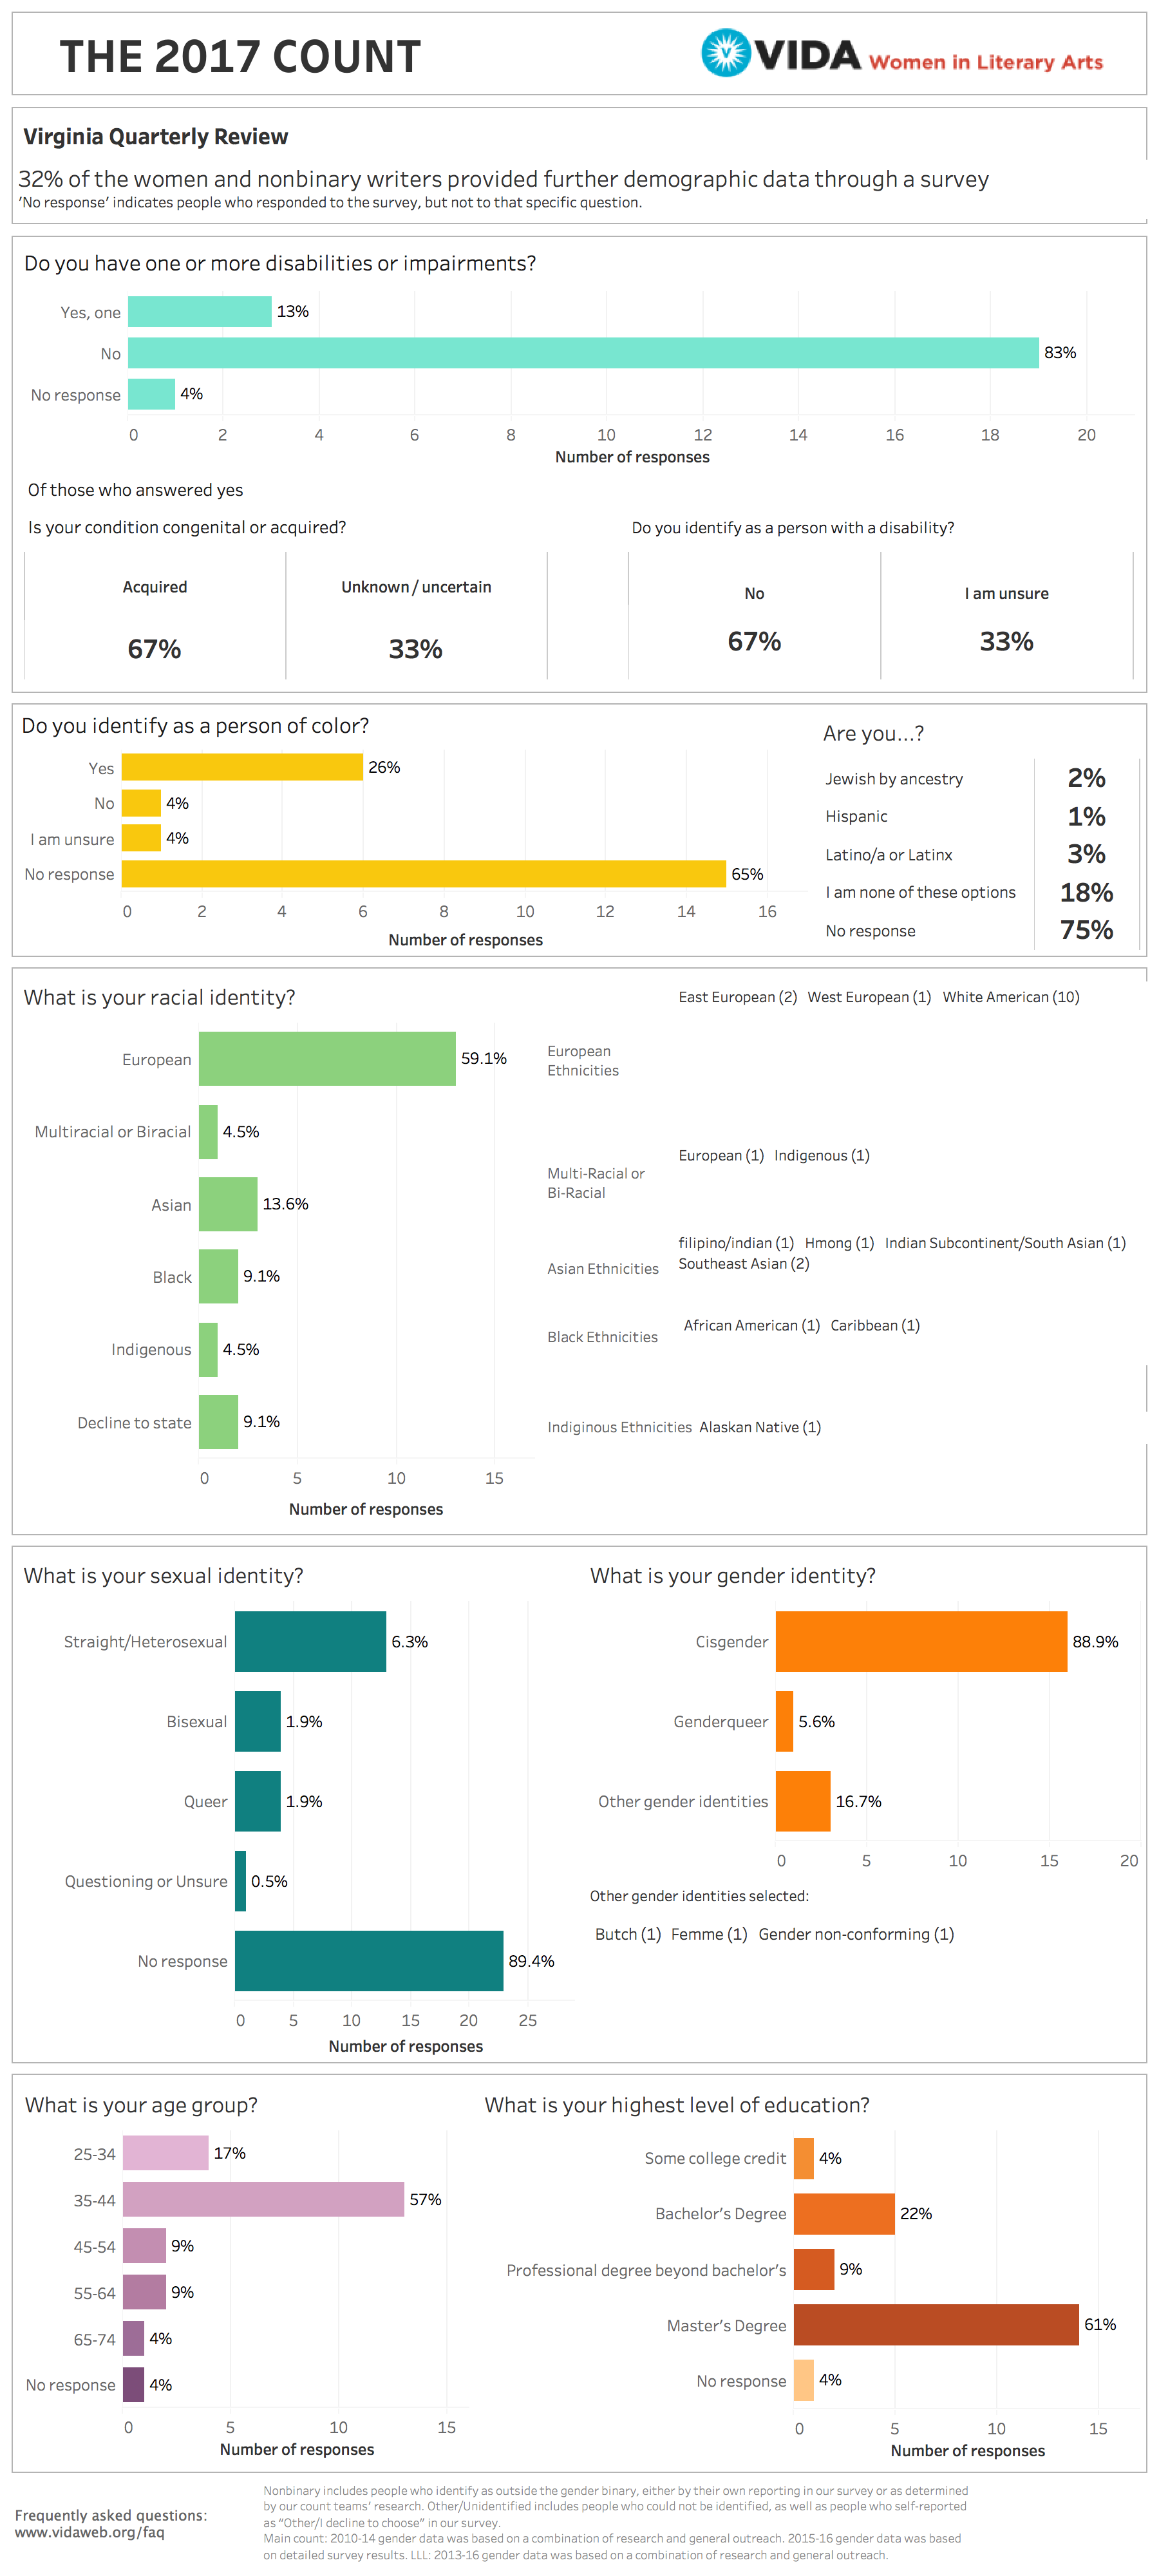 Virginia Quarterly Review 2017 VIDA Intersectional Survey Data